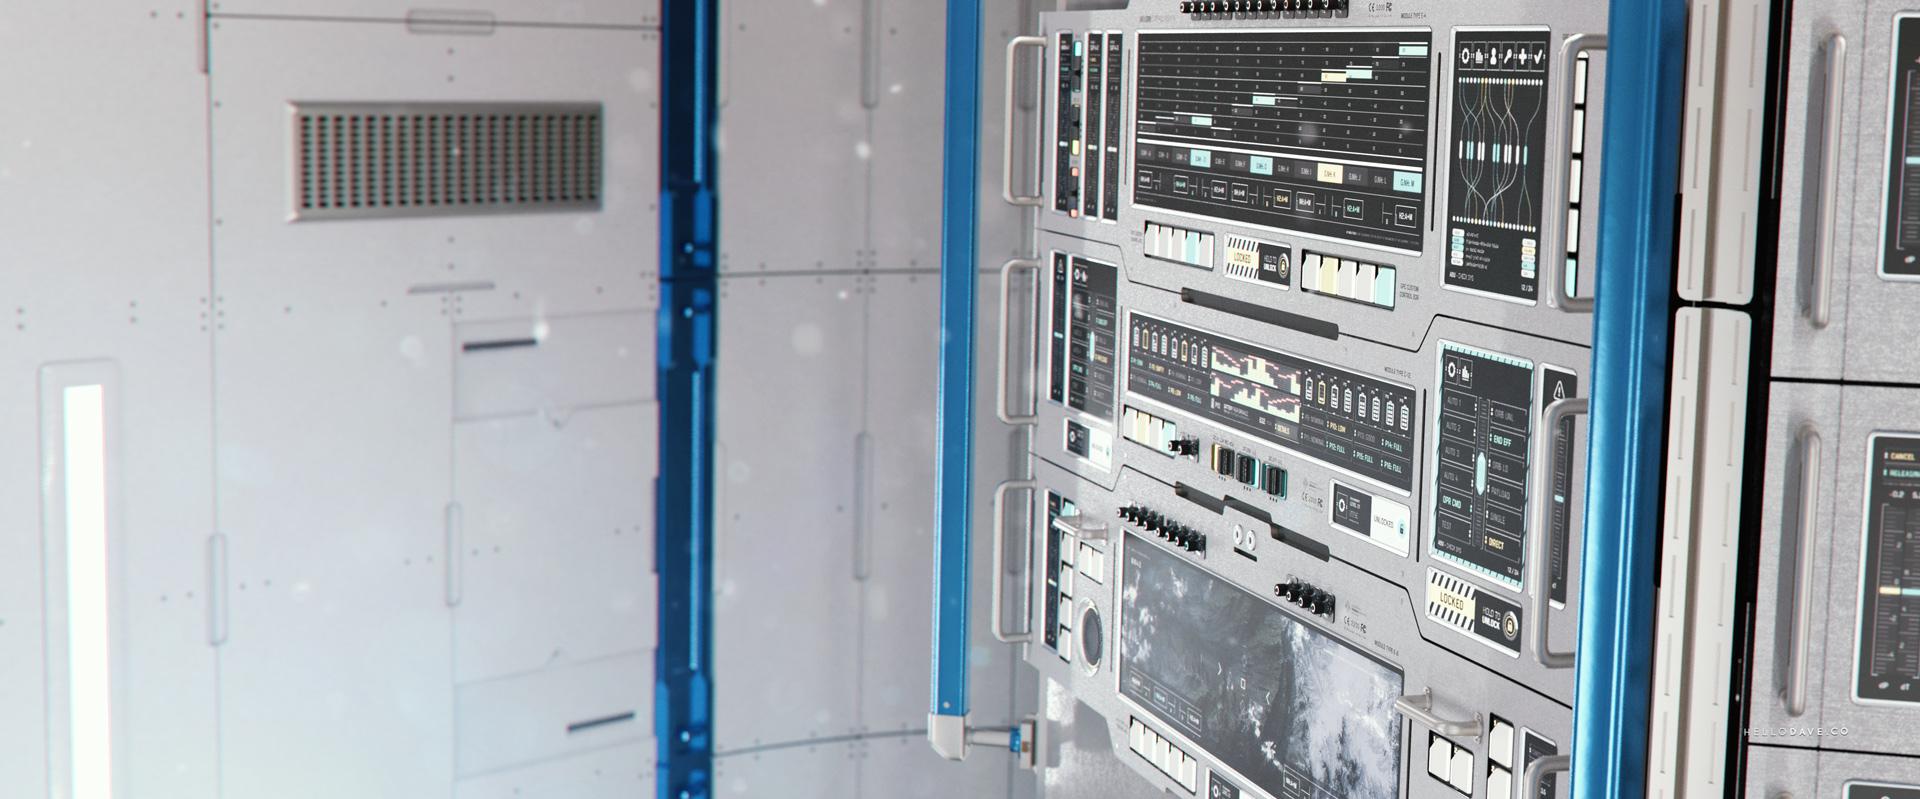 SpaceStation_hardwareTests_06_1920px